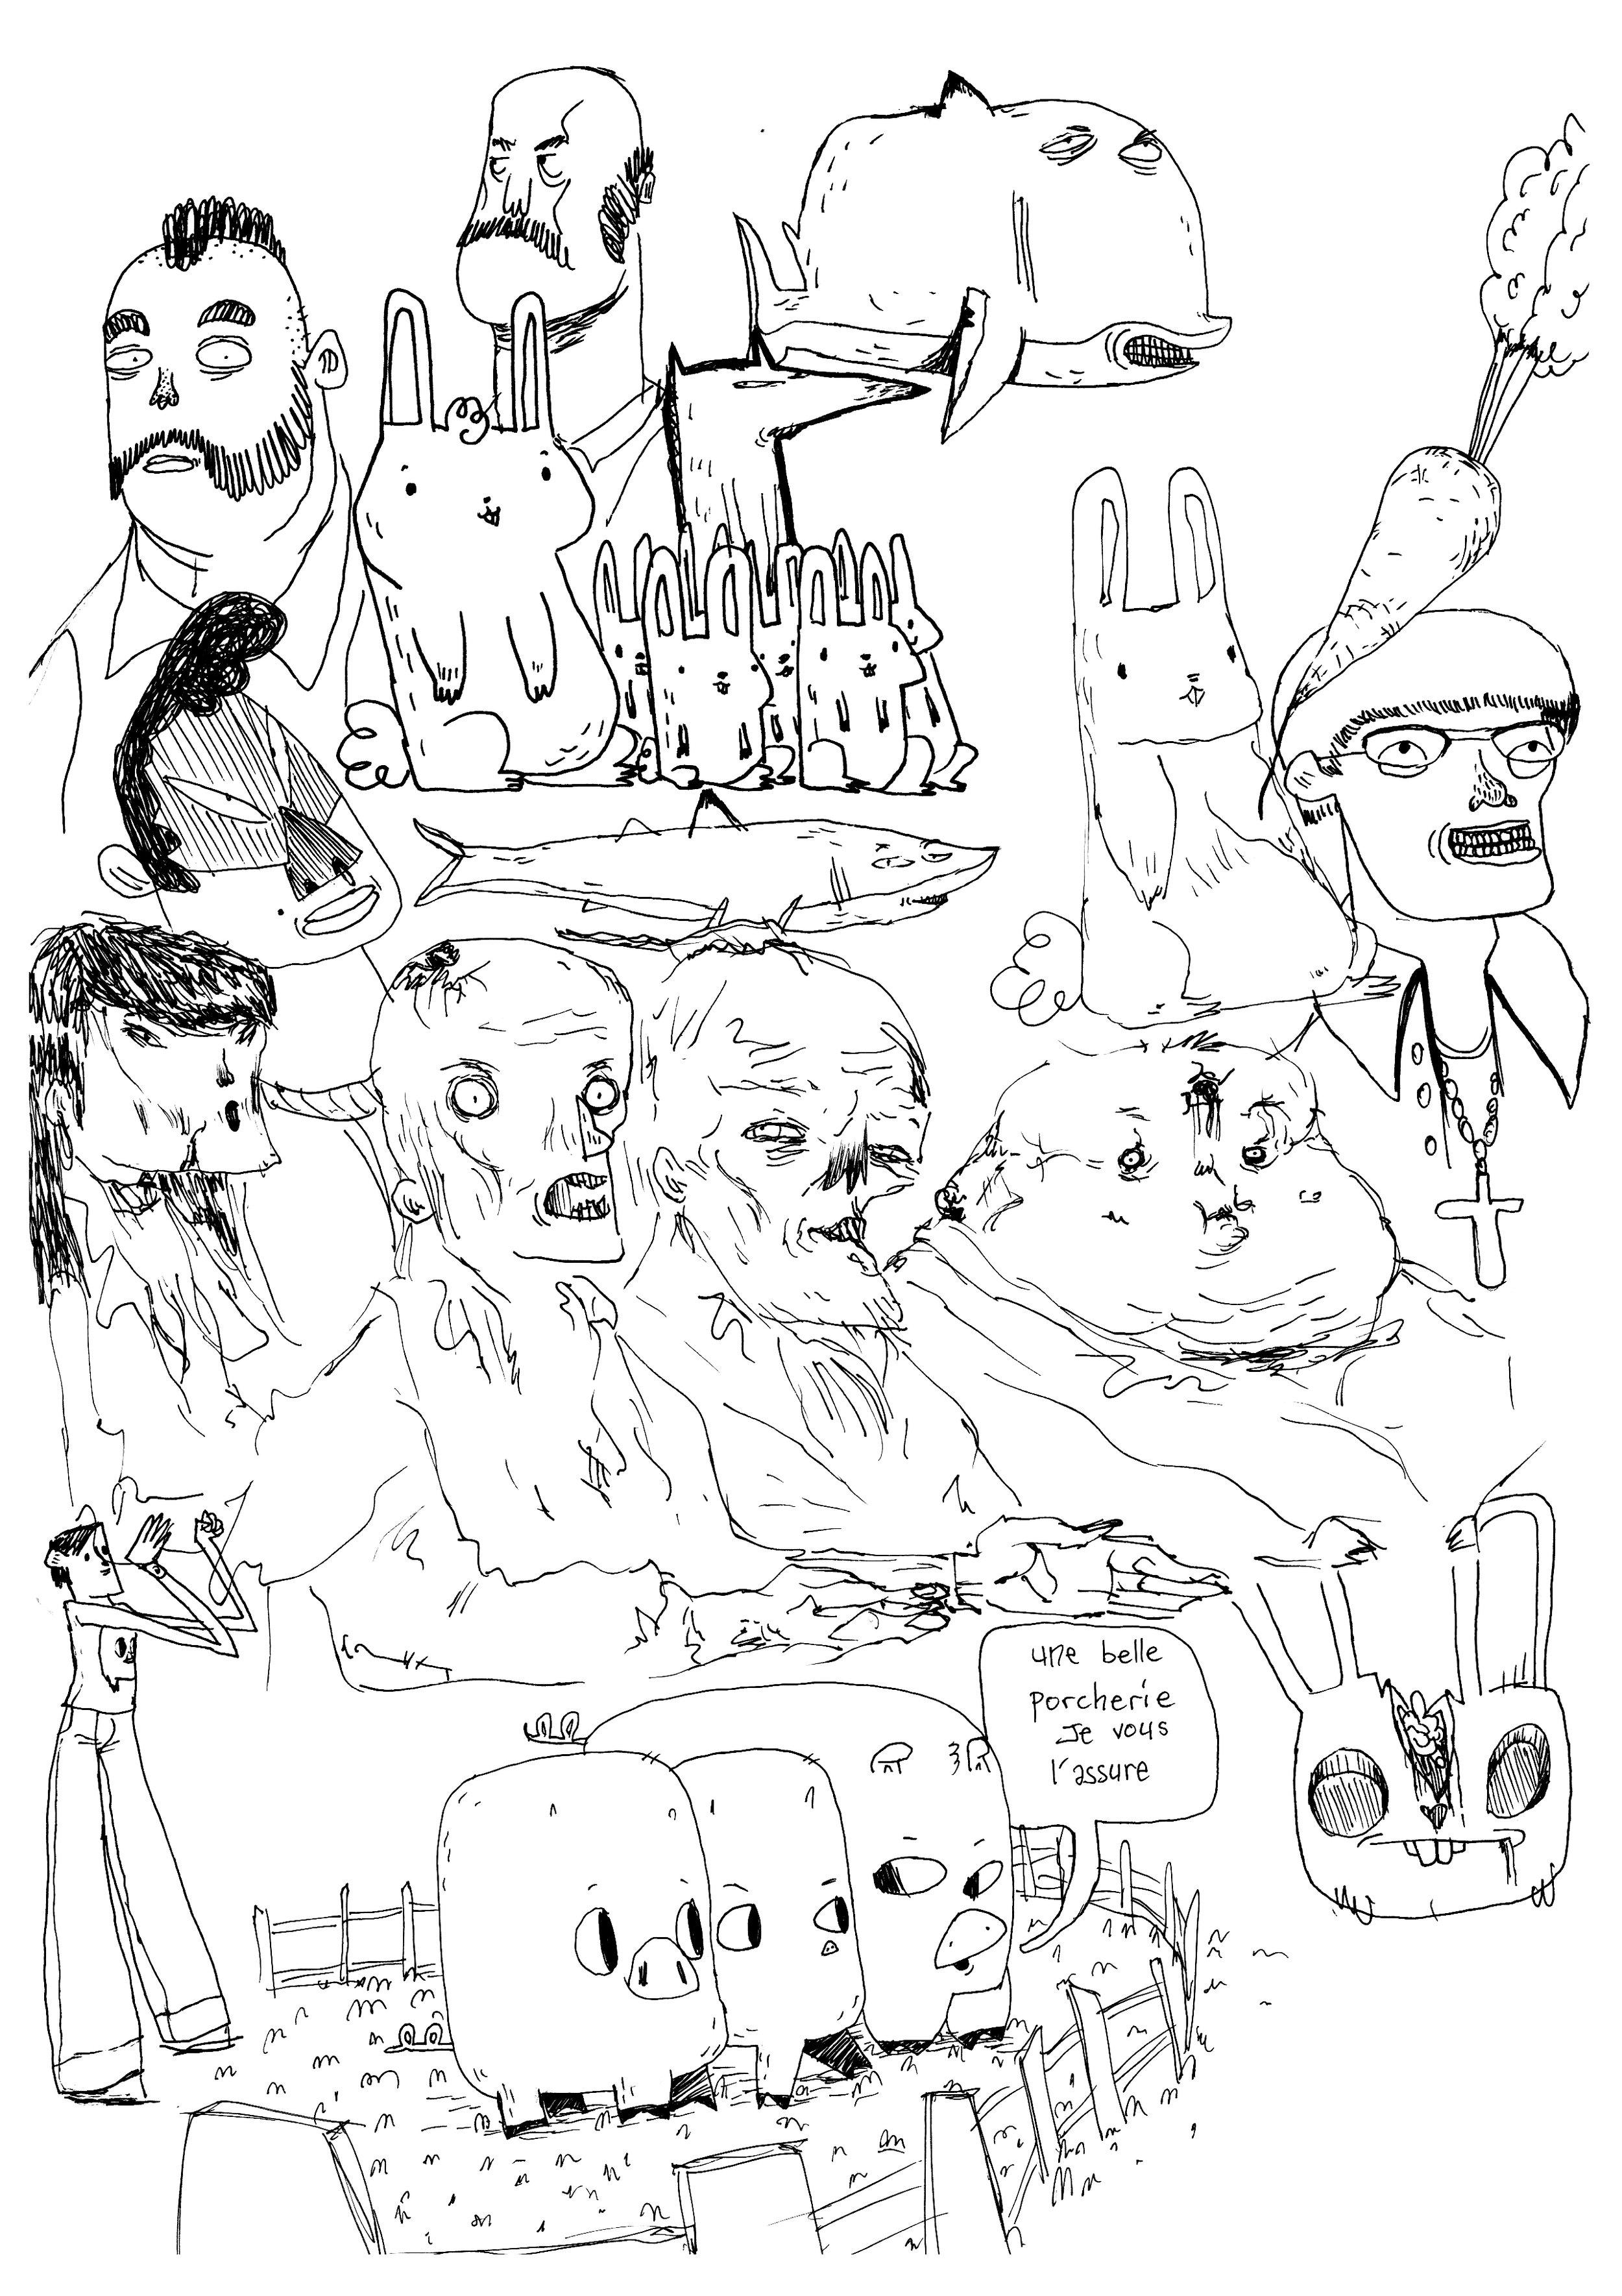 Pascal_Zaffiro_Doodle_25.jpg